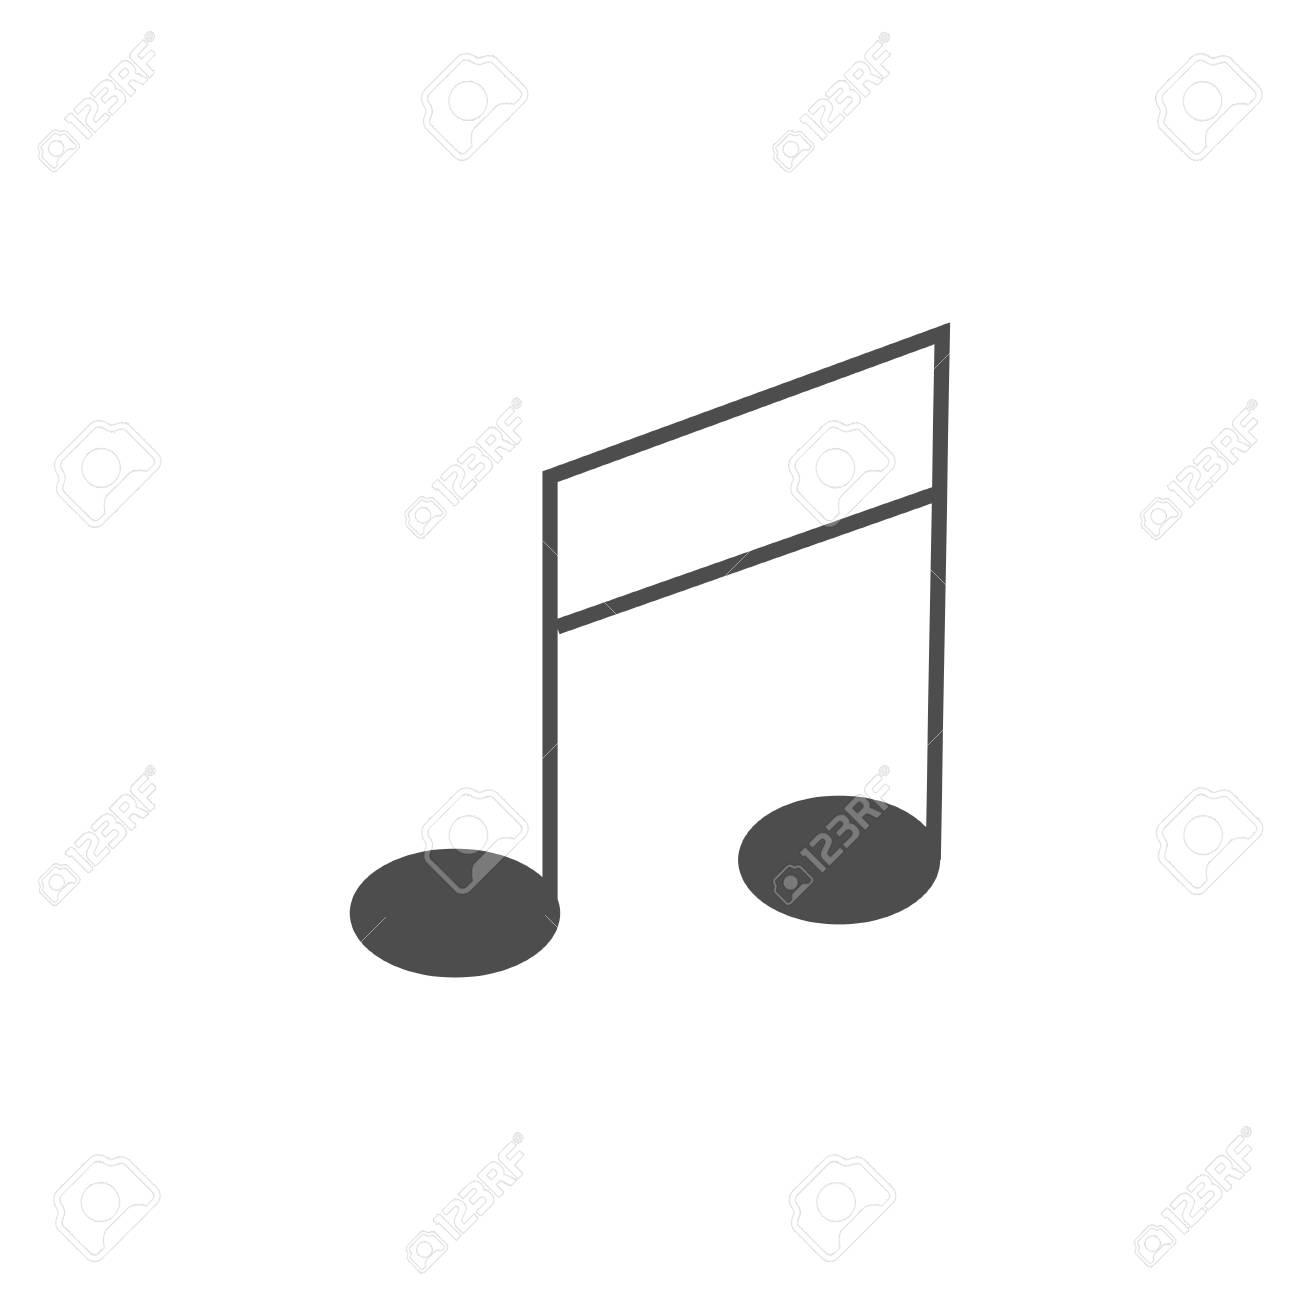 Music note icon isolated on white background flat style creative music note icon isolated on white background flat style creative symbol for your web buycottarizona Image collections